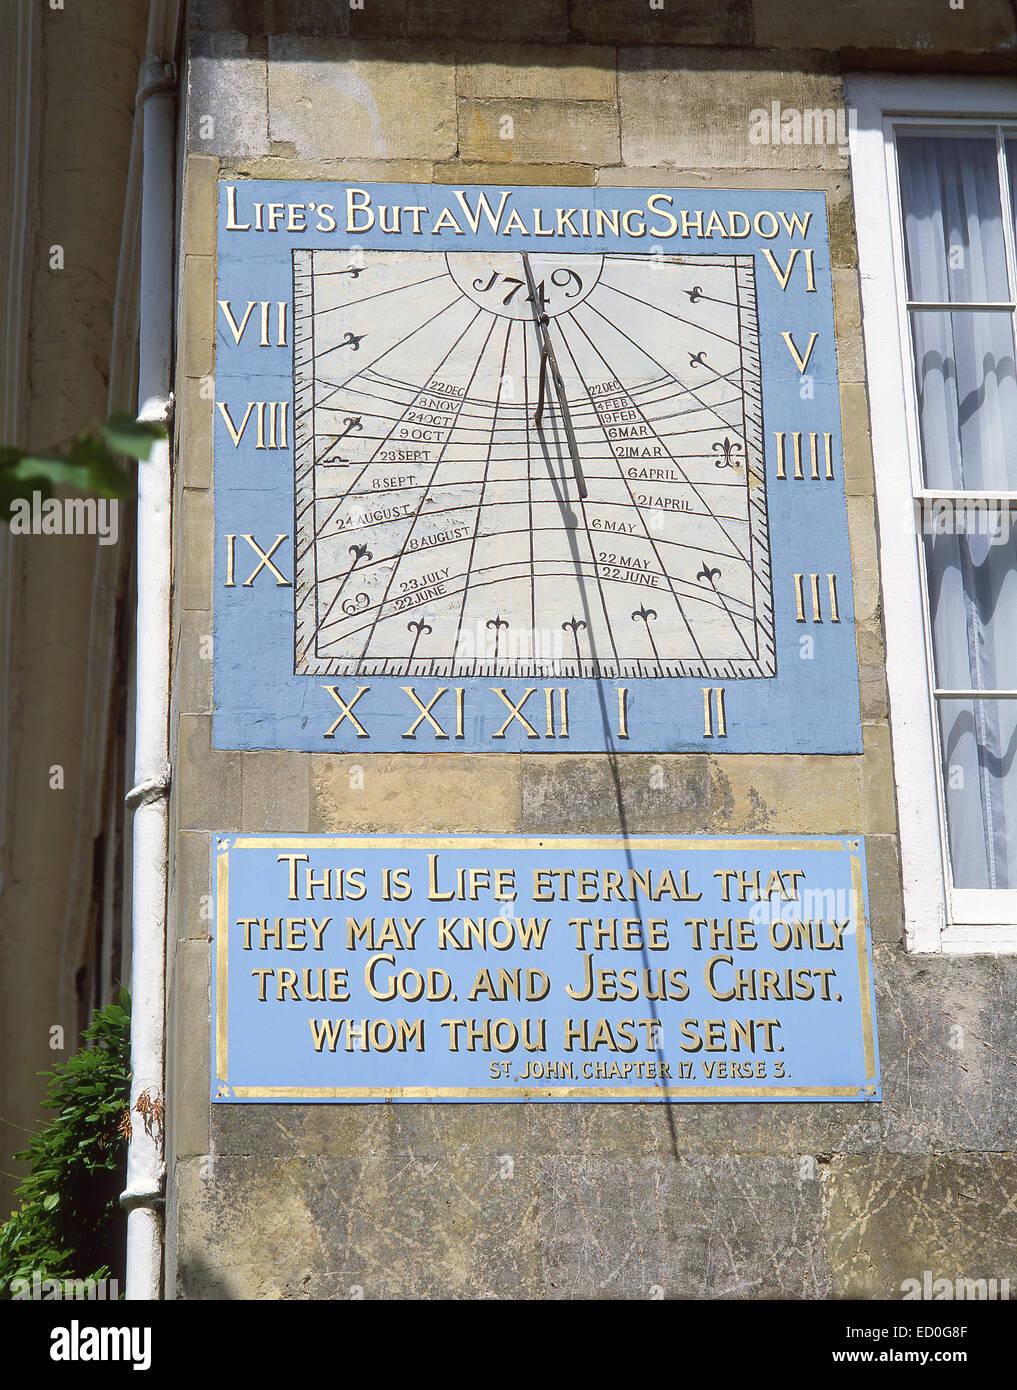 Xviii secolo declino verticale meridiana, Malmesbury House, Cattedrale vicino, Salisbury, Wiltshire, Inghilterra, Immagini Stock